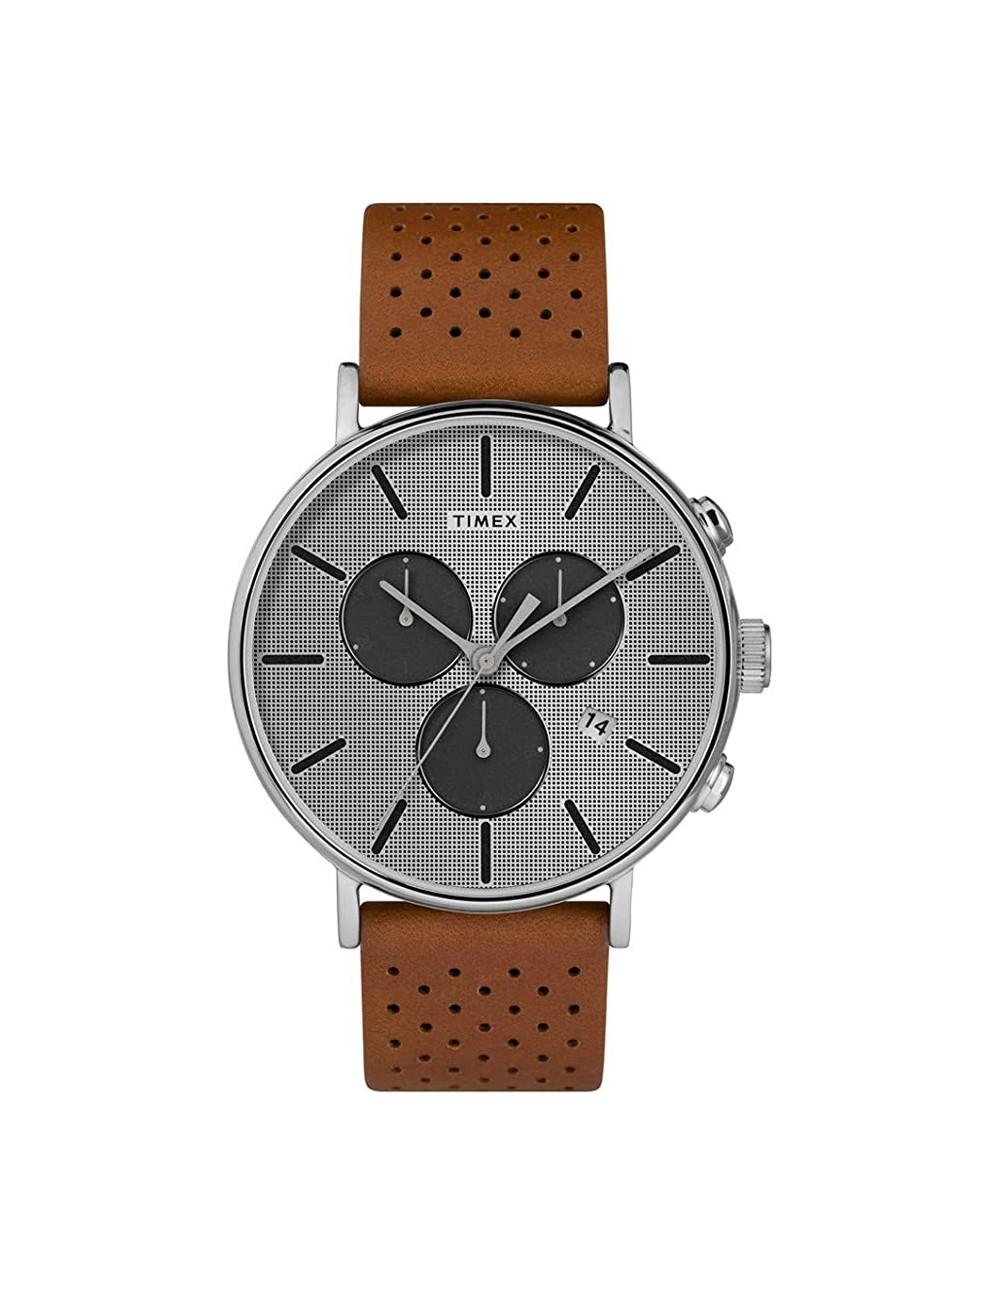 Timex Fairfield Supernova TW2R79900 Mens Watch Chronograph